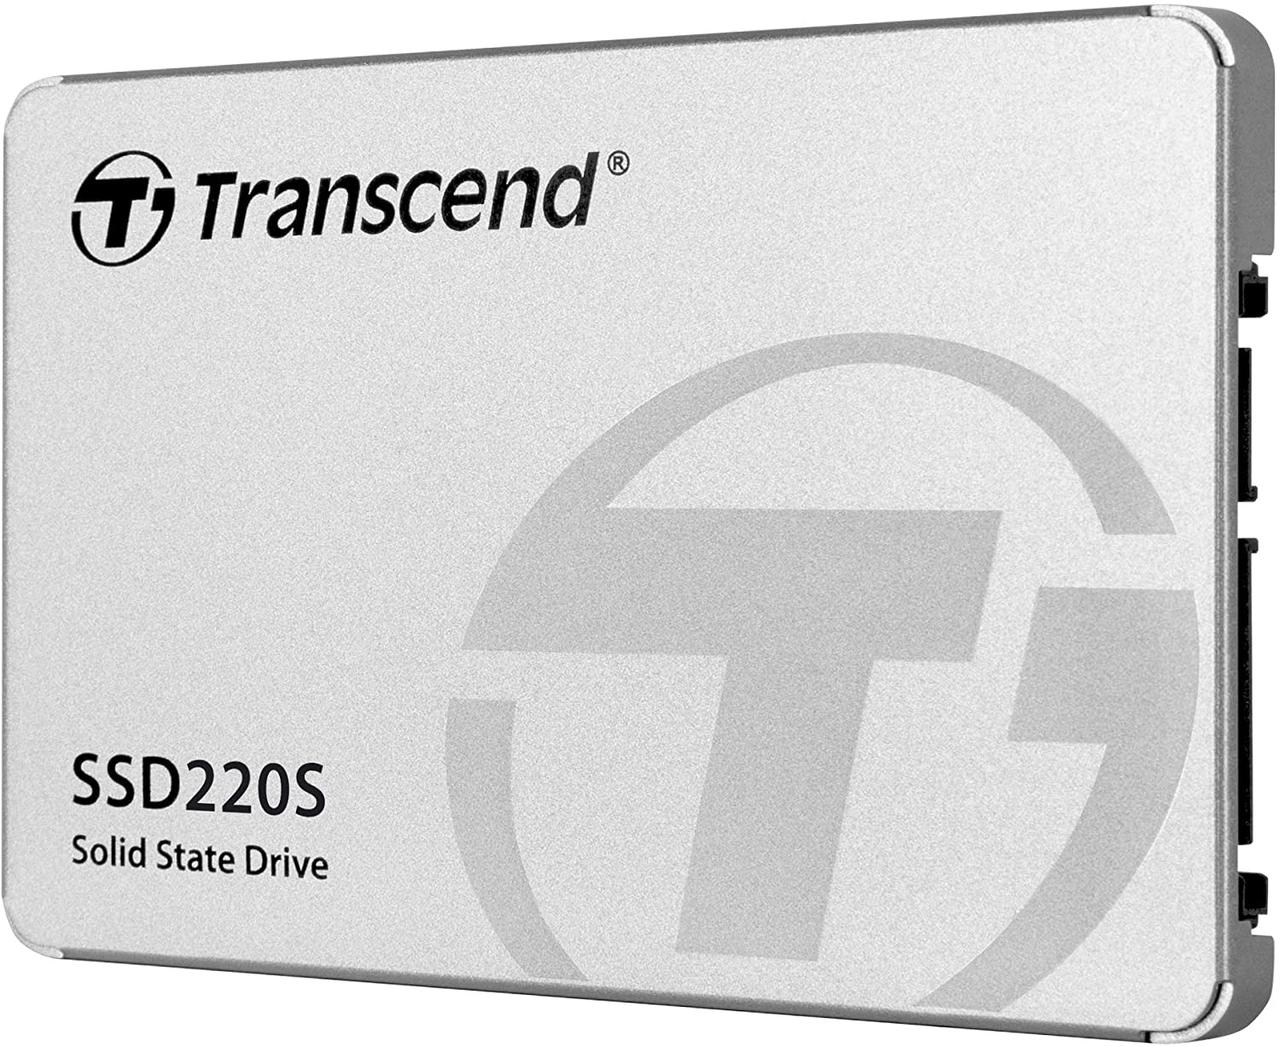 Жесткий диск SSD 480GB Transcend TS480GSSD220S 480